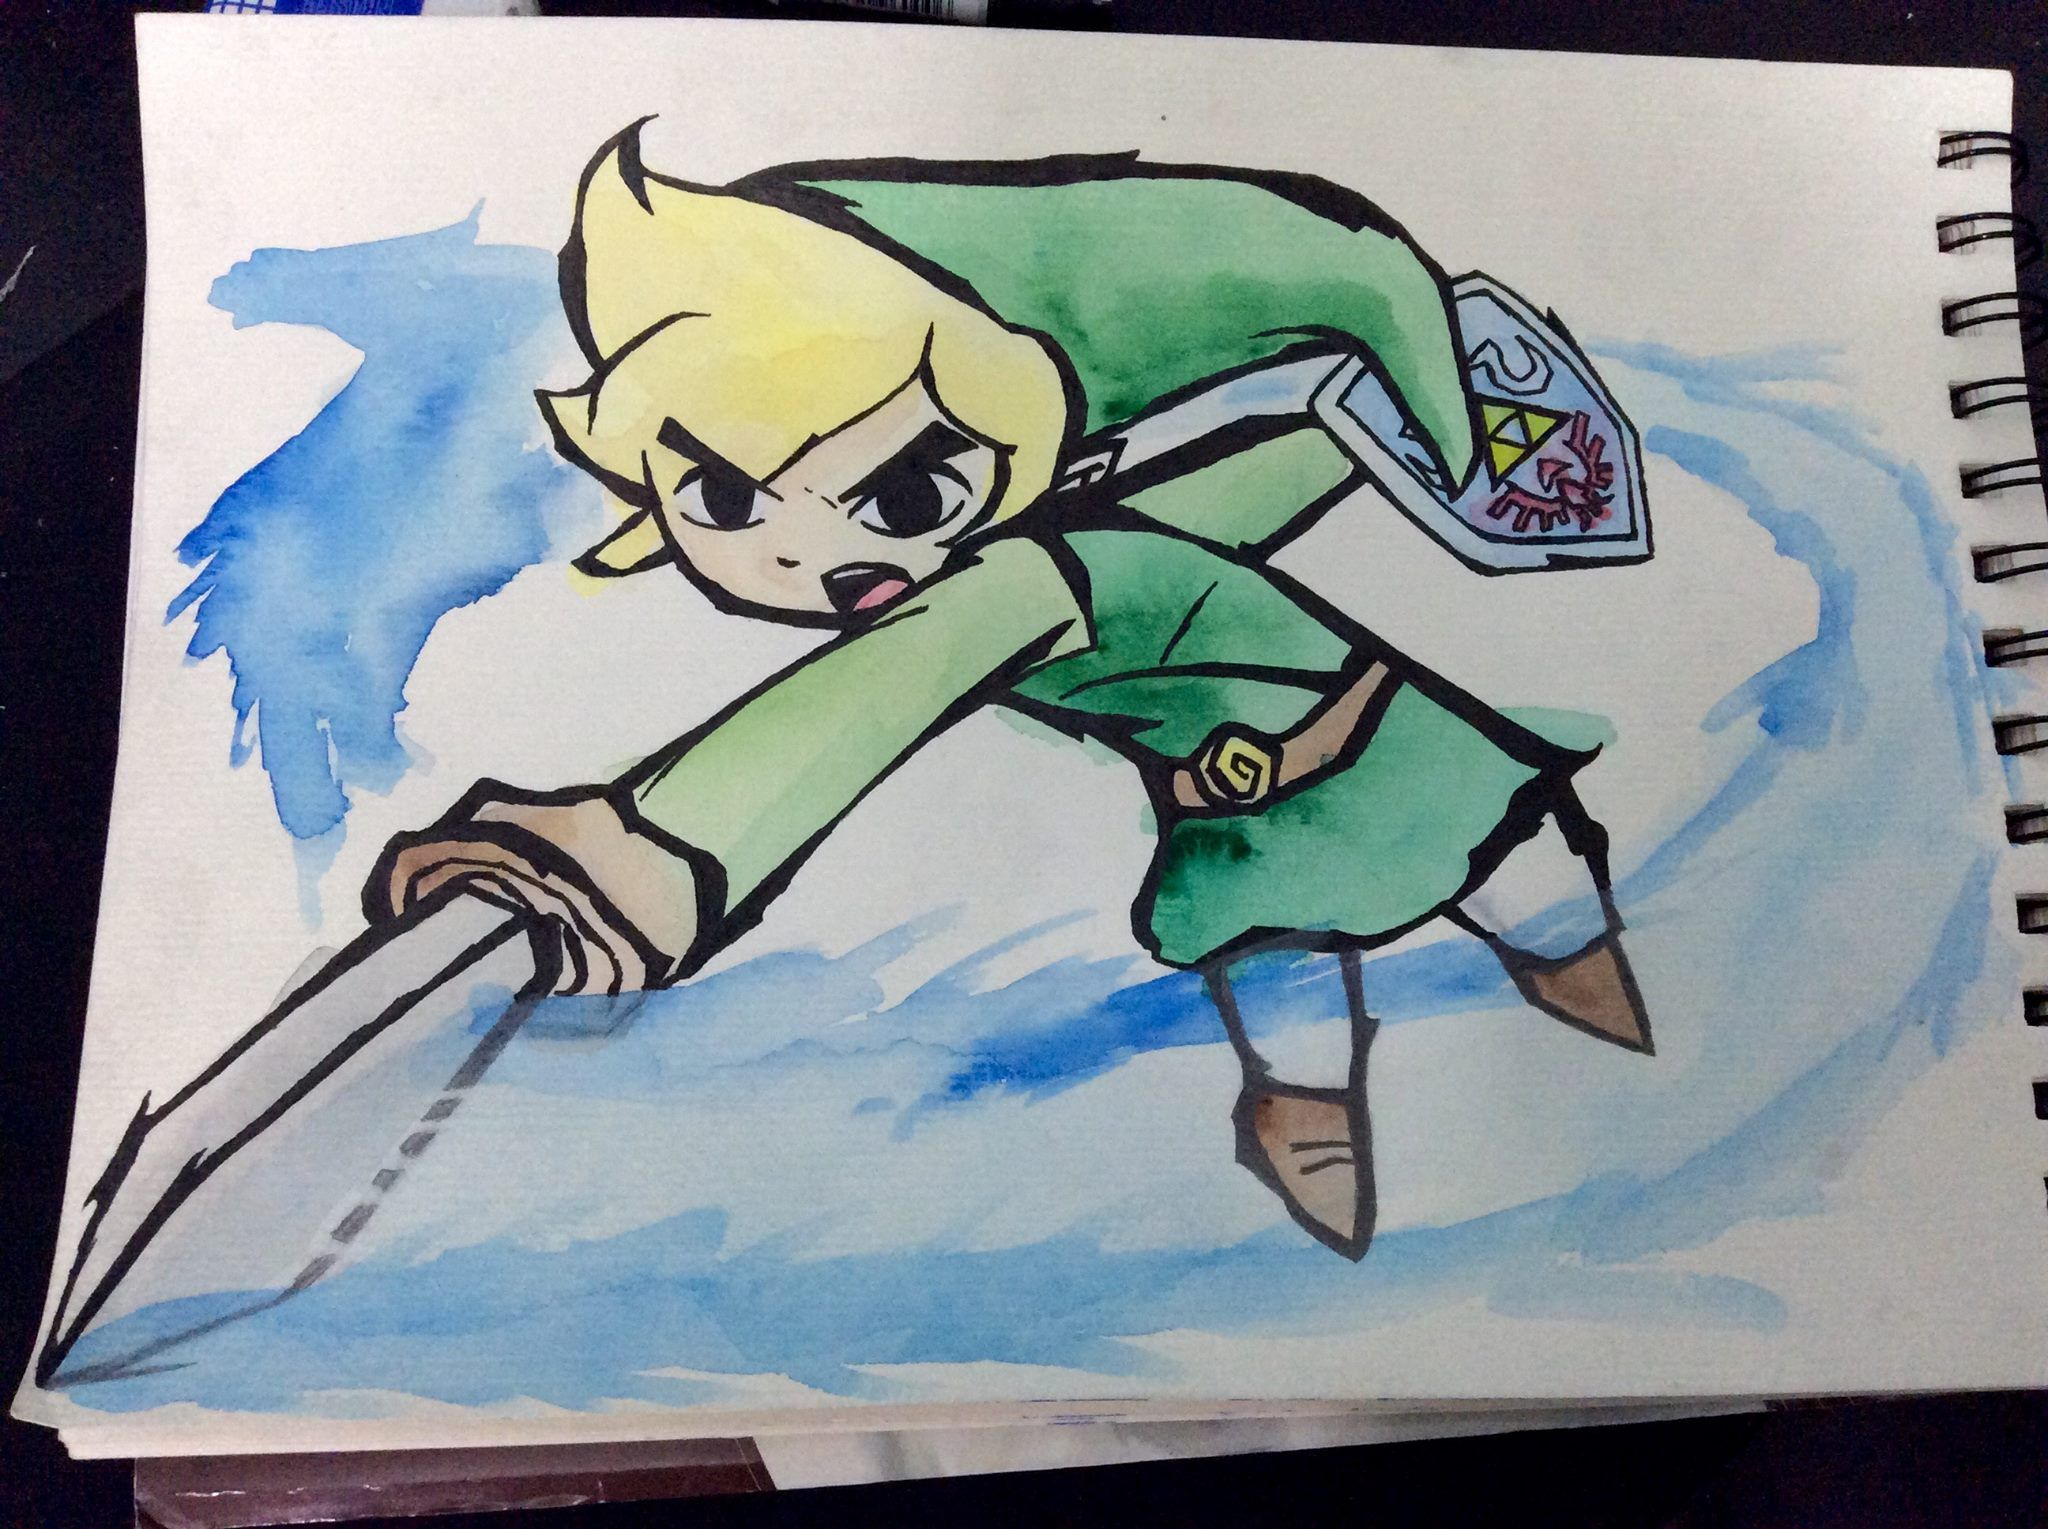 Game with watercolor - Toon Link Watercolor Ink Process Legendofzelda